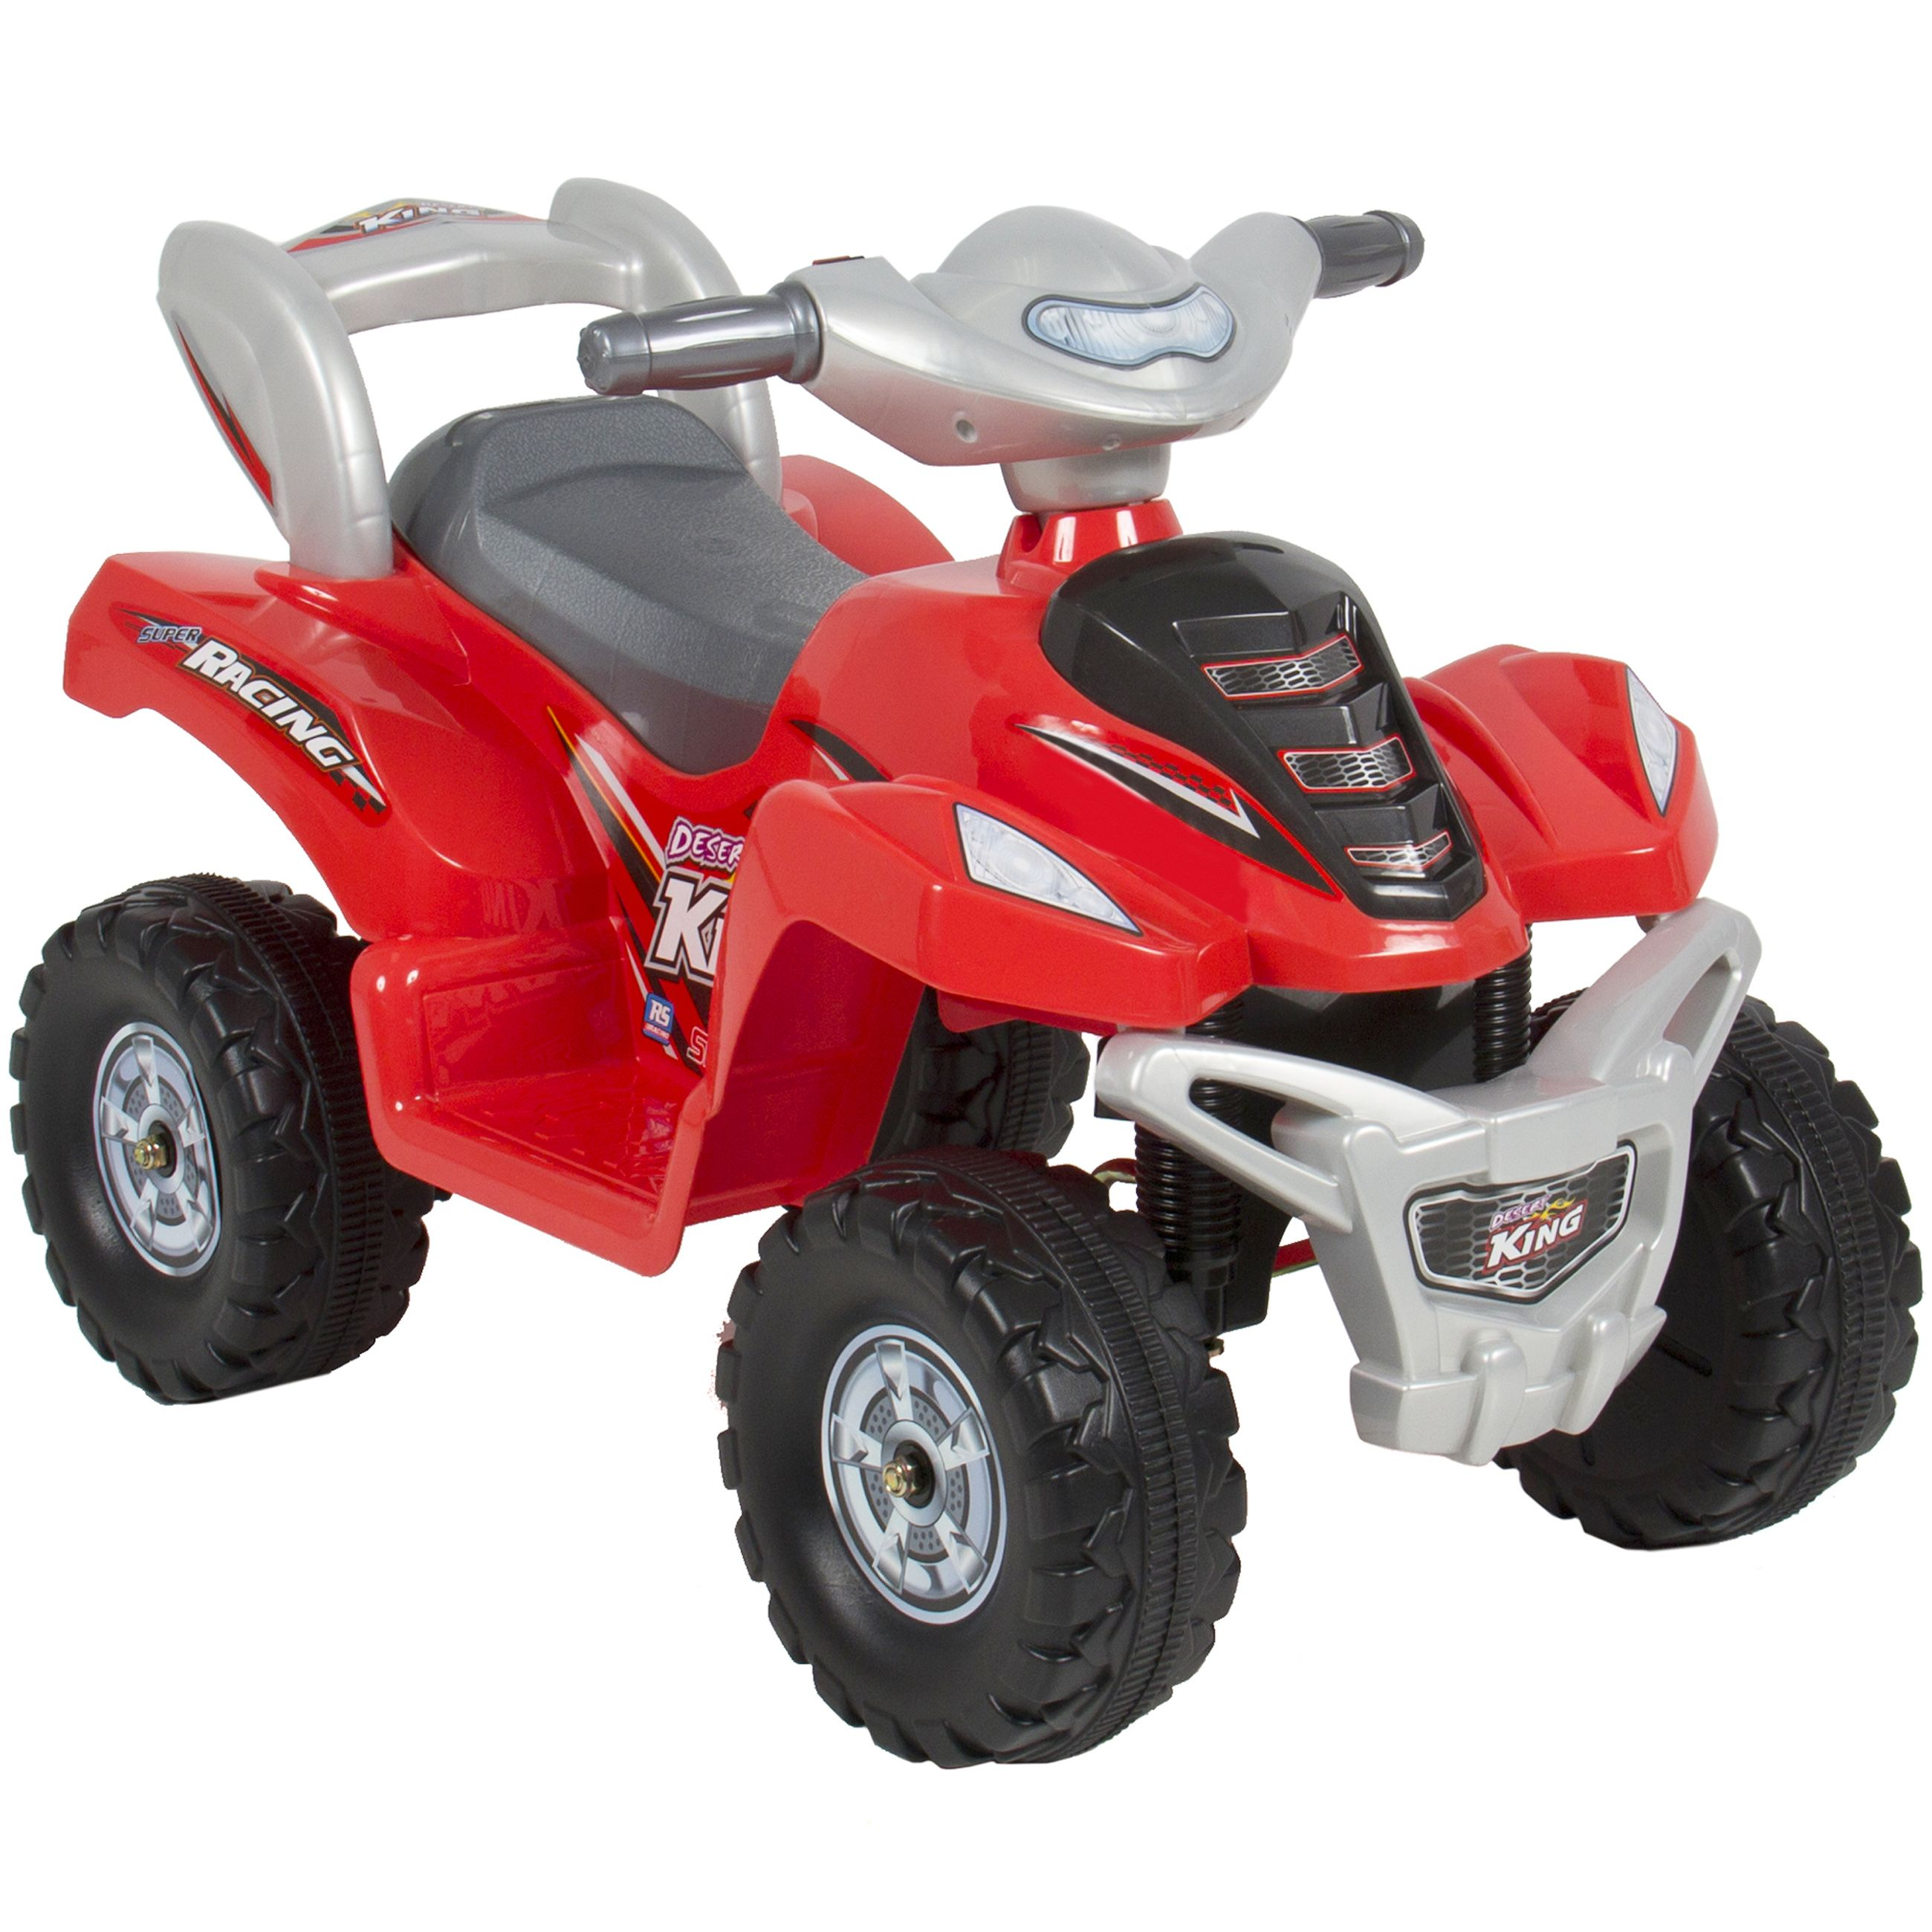 Kids Ride On Atv 6v Toy Quad Battery Power Electric 4 Wheel Power